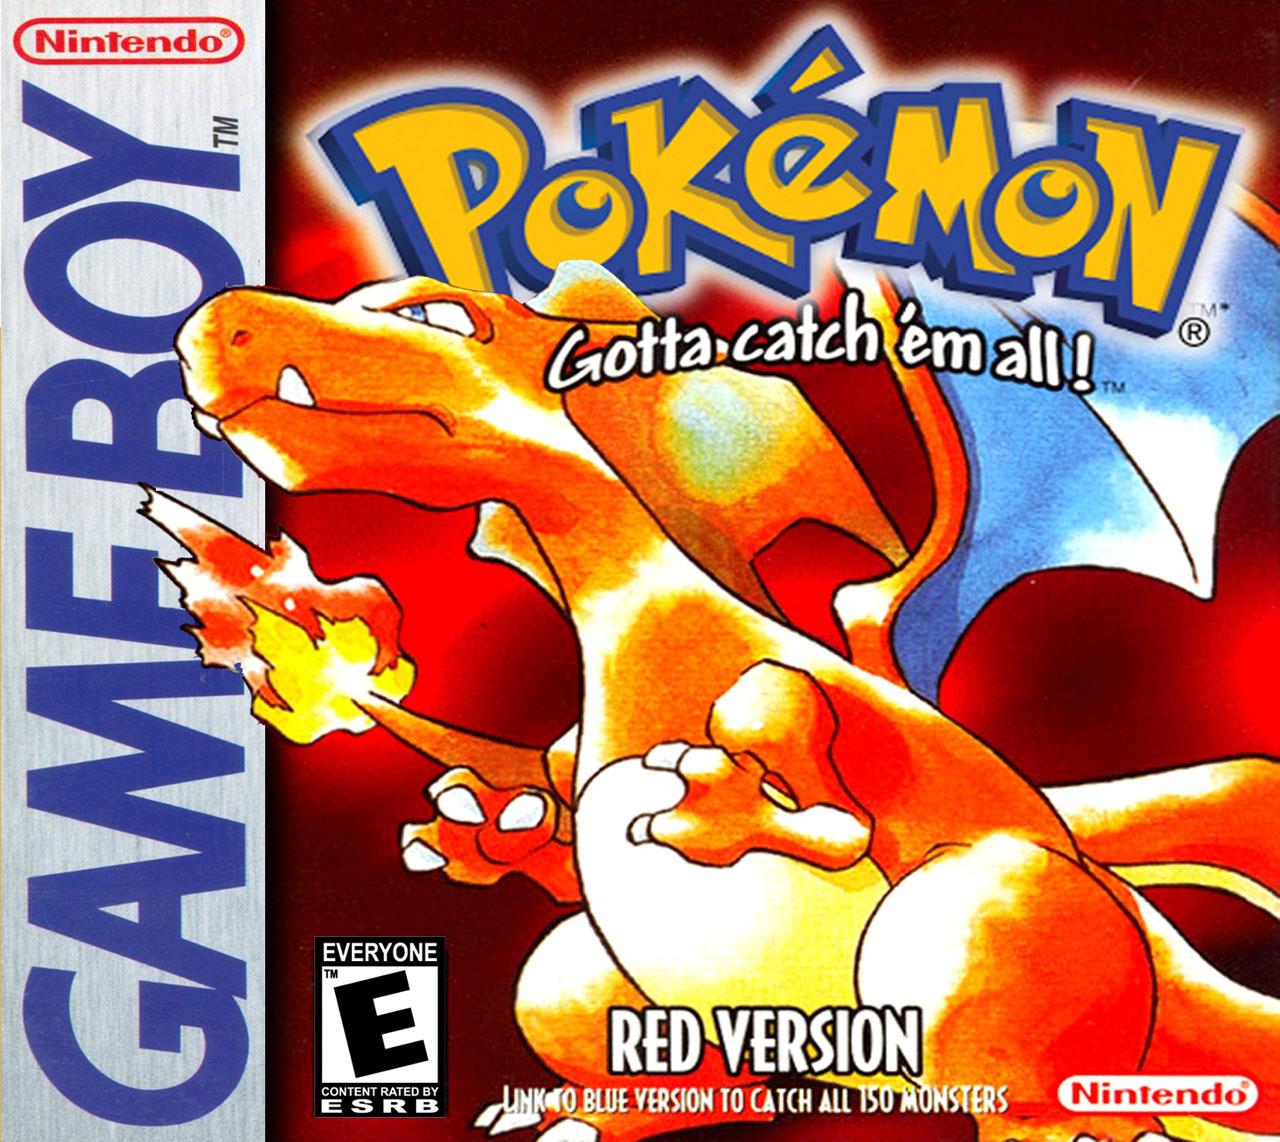 Pokemon Red on Gameboy